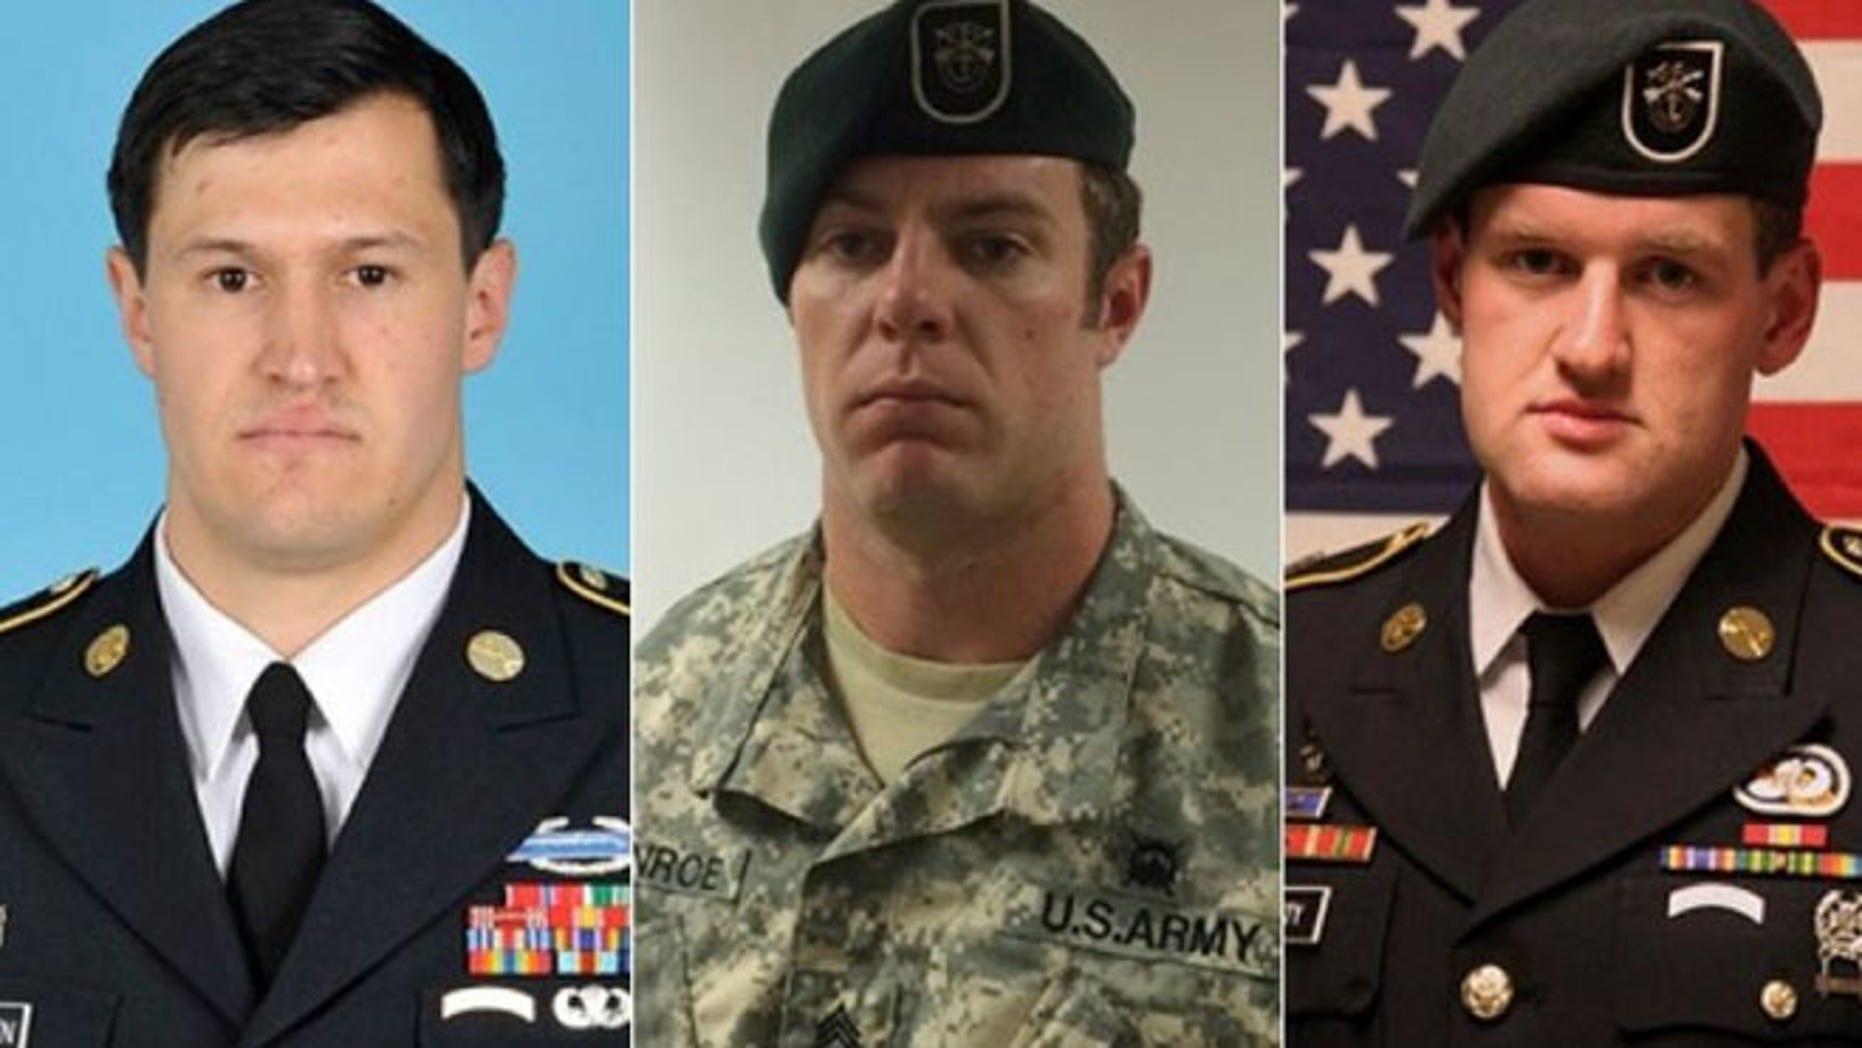 From left: Staff Sgt. Matthew Lewellen, Staff Sgt. Kevin McEnroe, Staff Sgt. James Moriarty.  (U.S. Army)